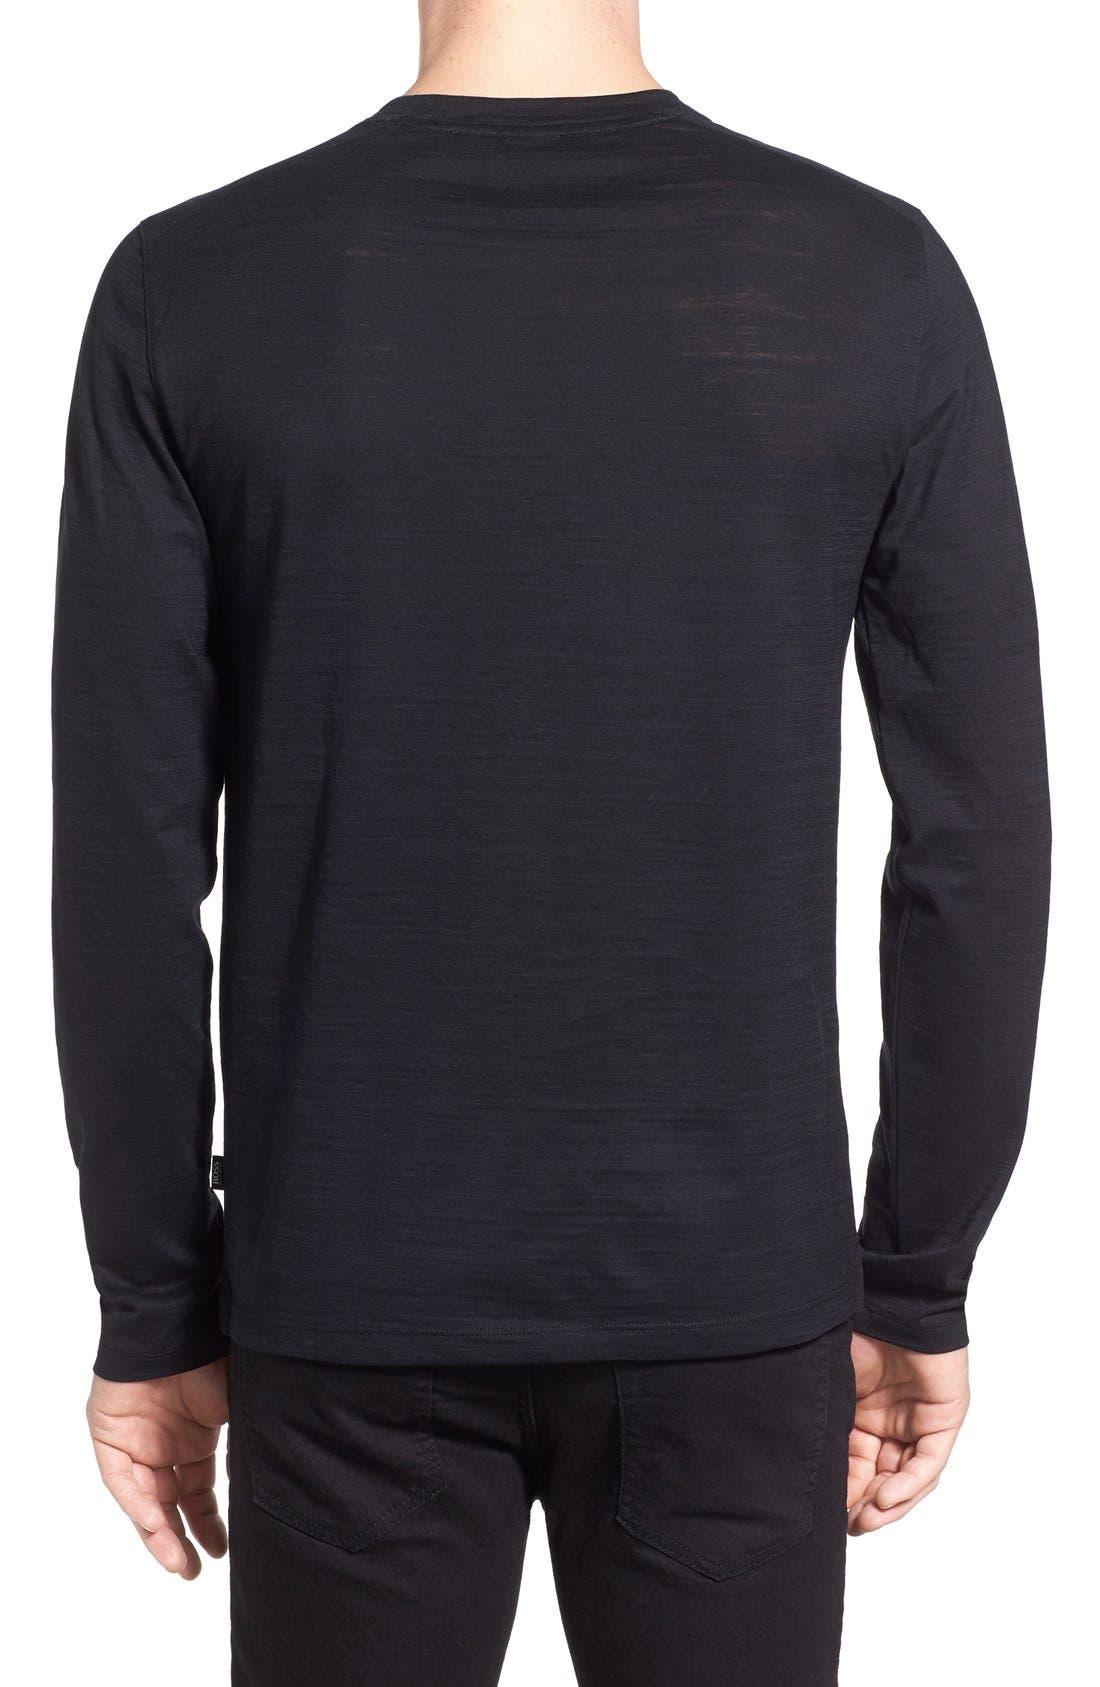 'Tenison' Slim Fit Long Sleeve T-Shirt,                             Alternate thumbnail 2, color,                             001